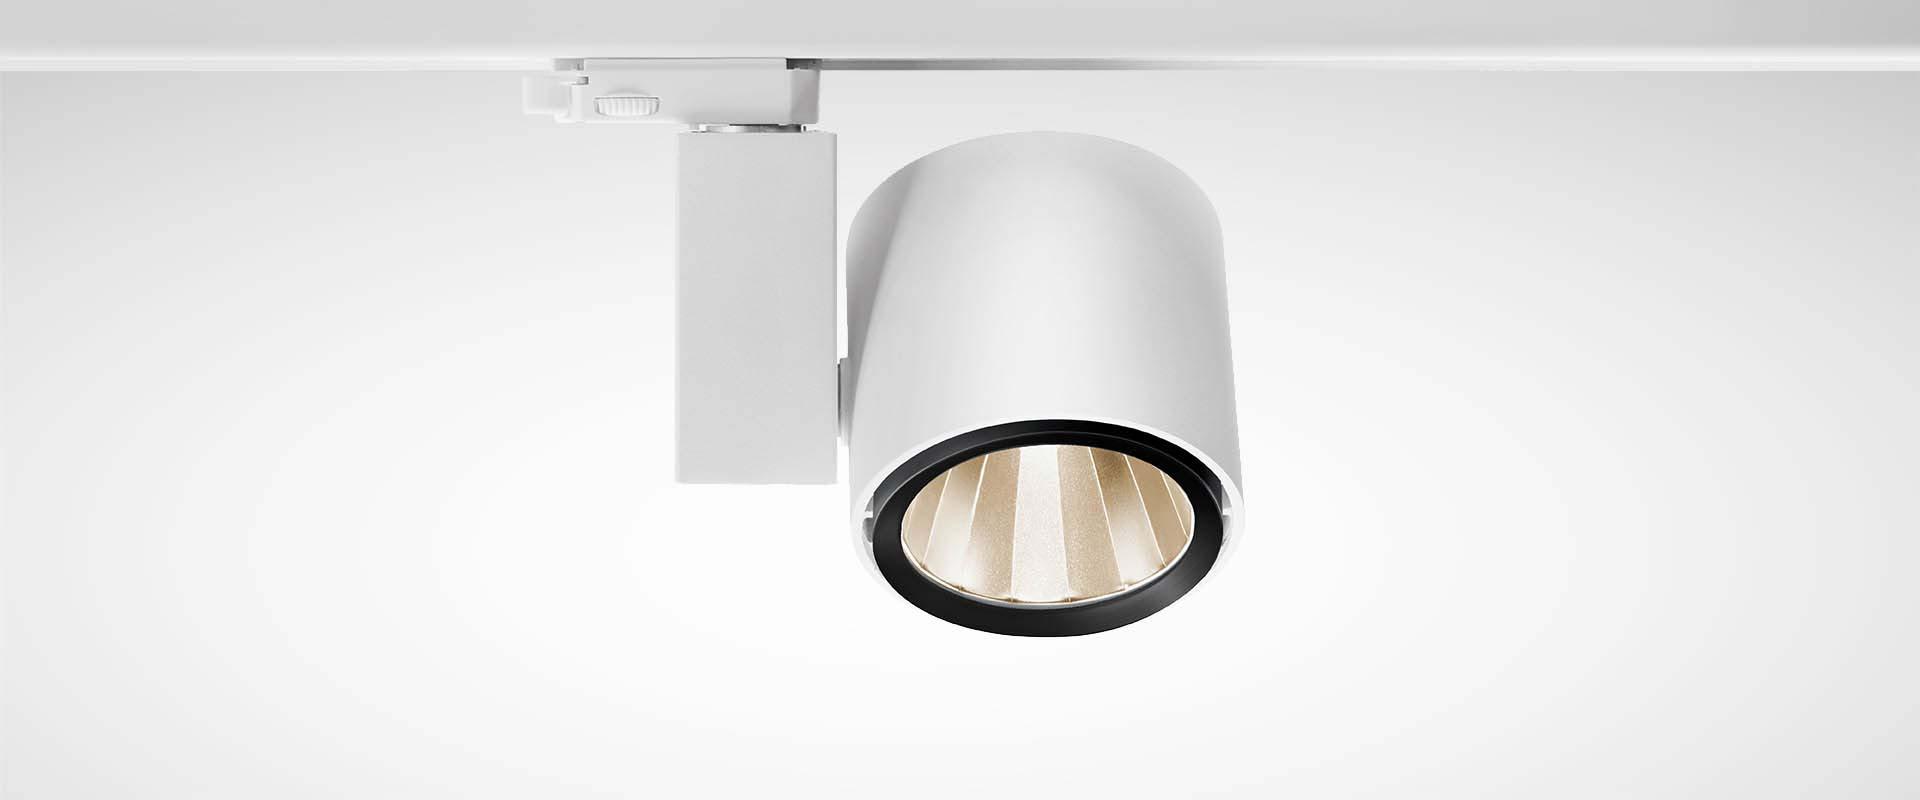 Lobu LED & Lobu LED - Products - TRILUX Simplify Your Light